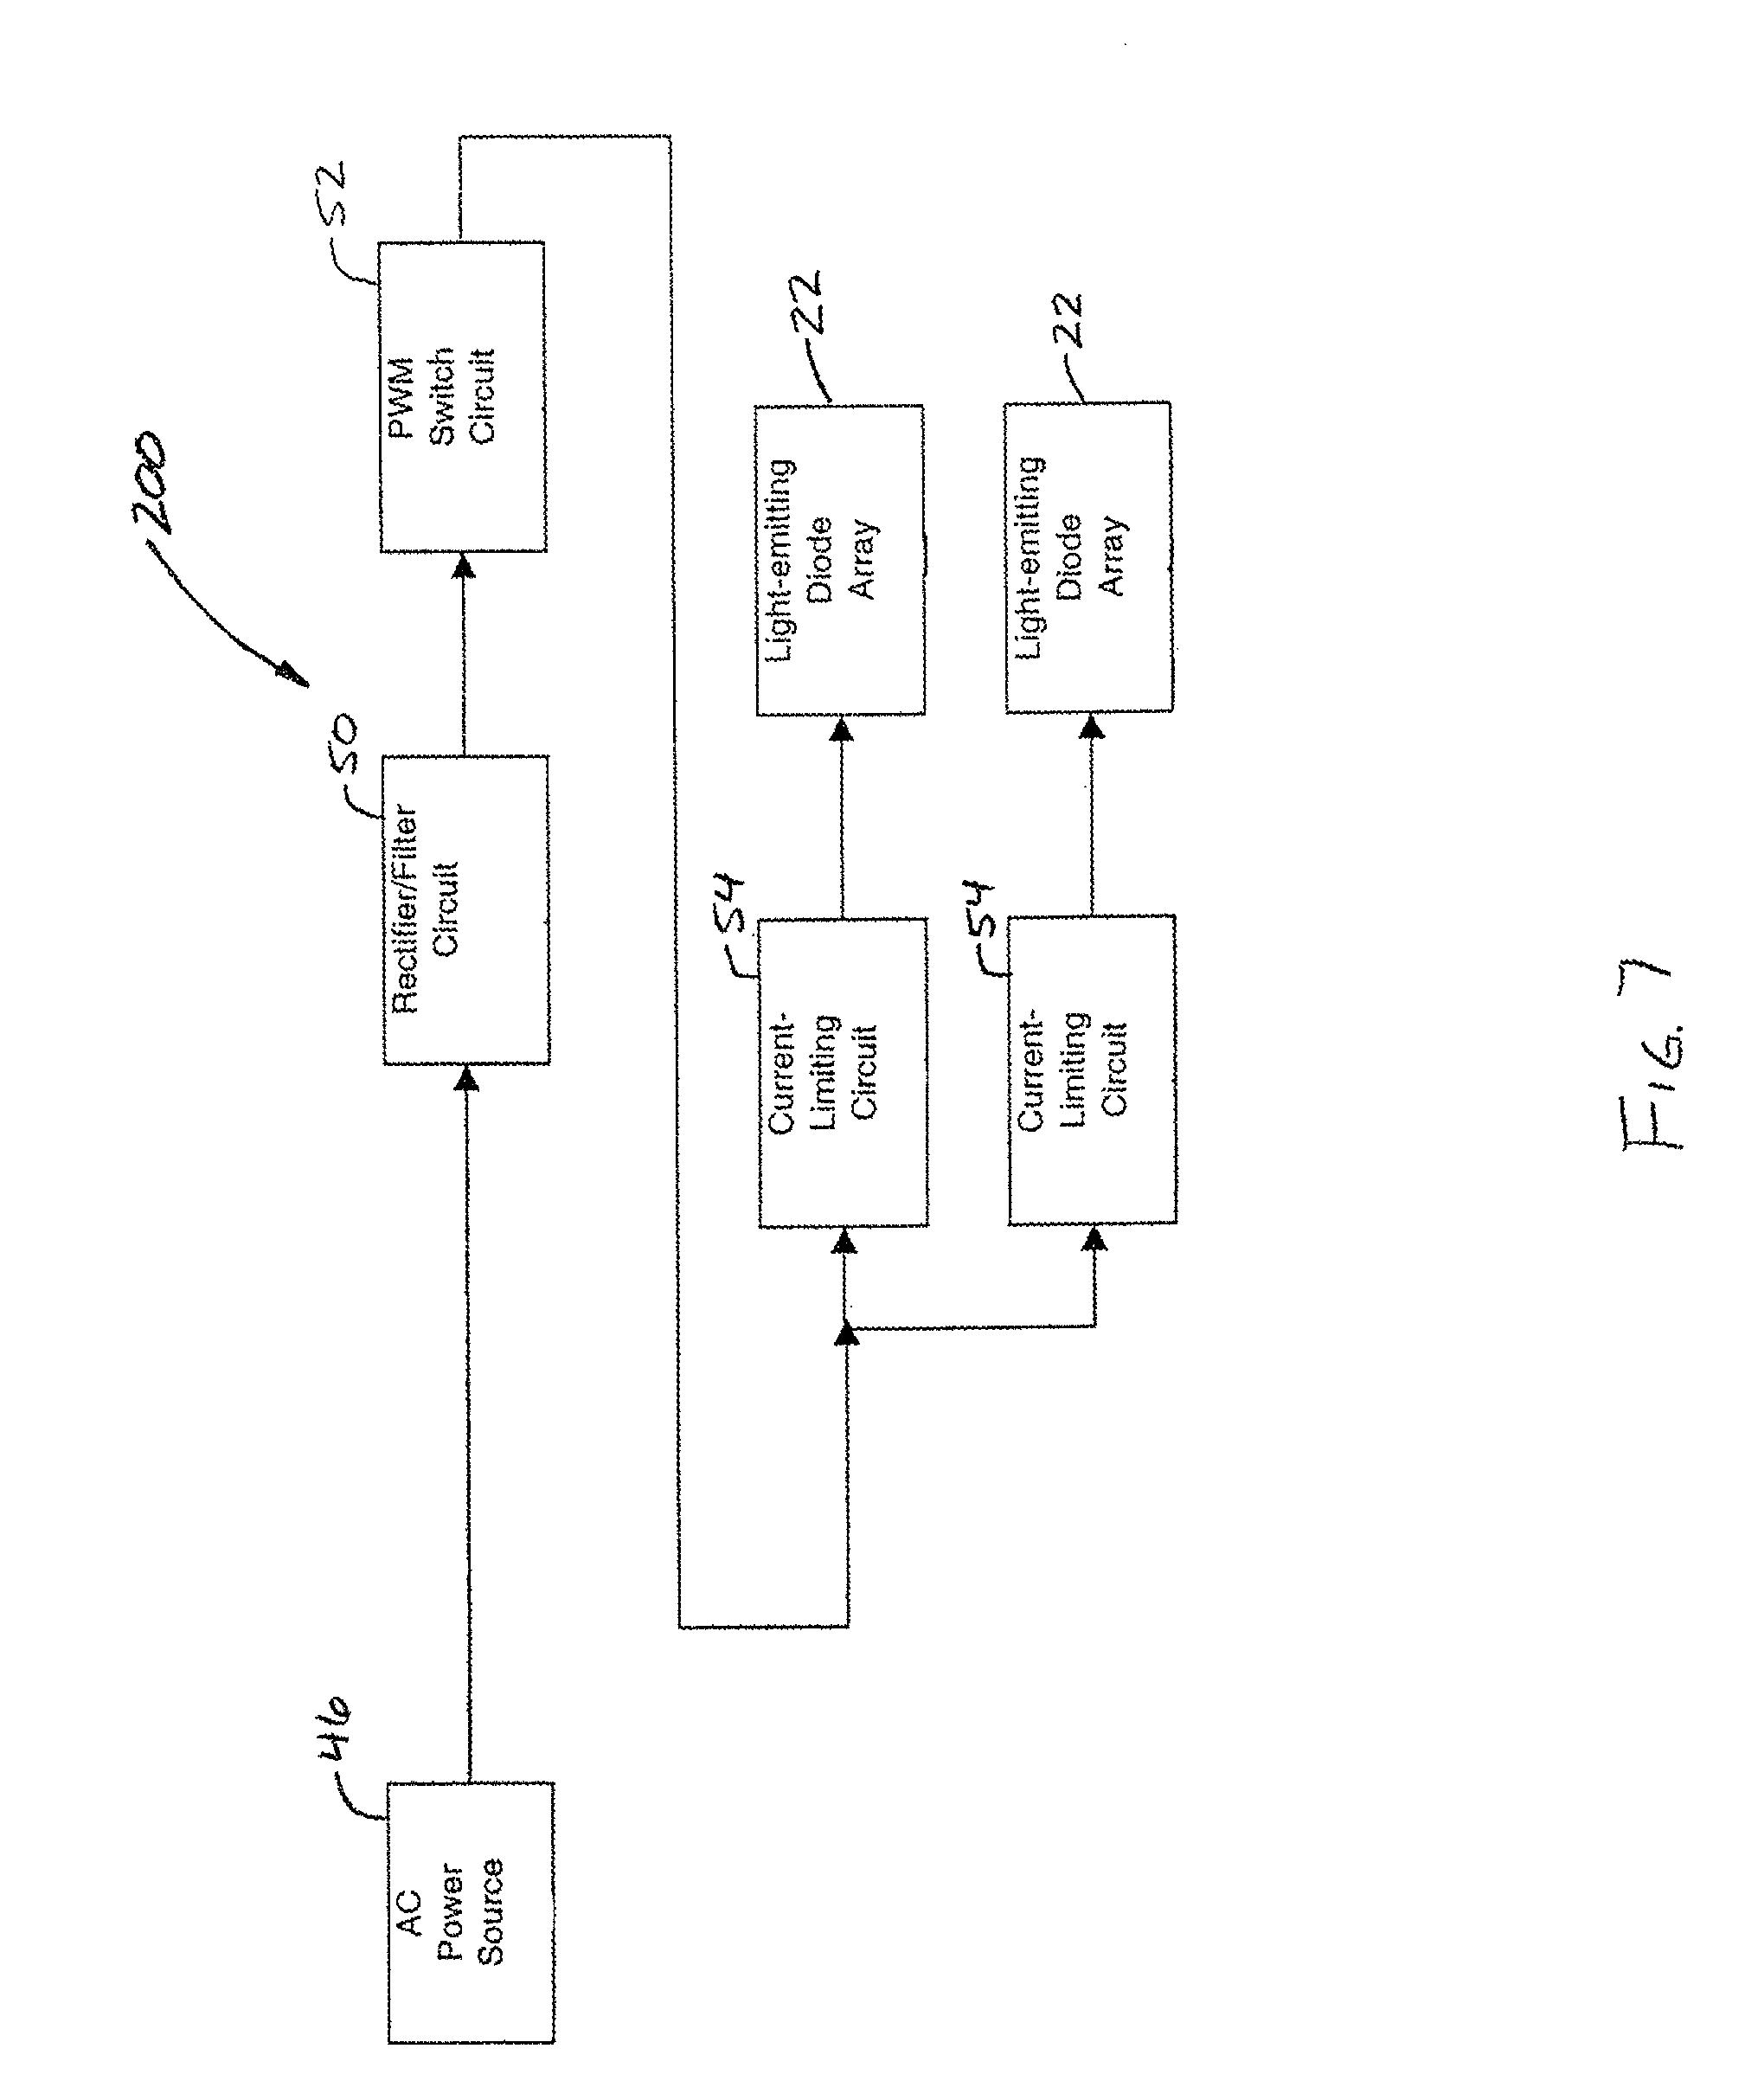 Patent US 9,803,806 B2